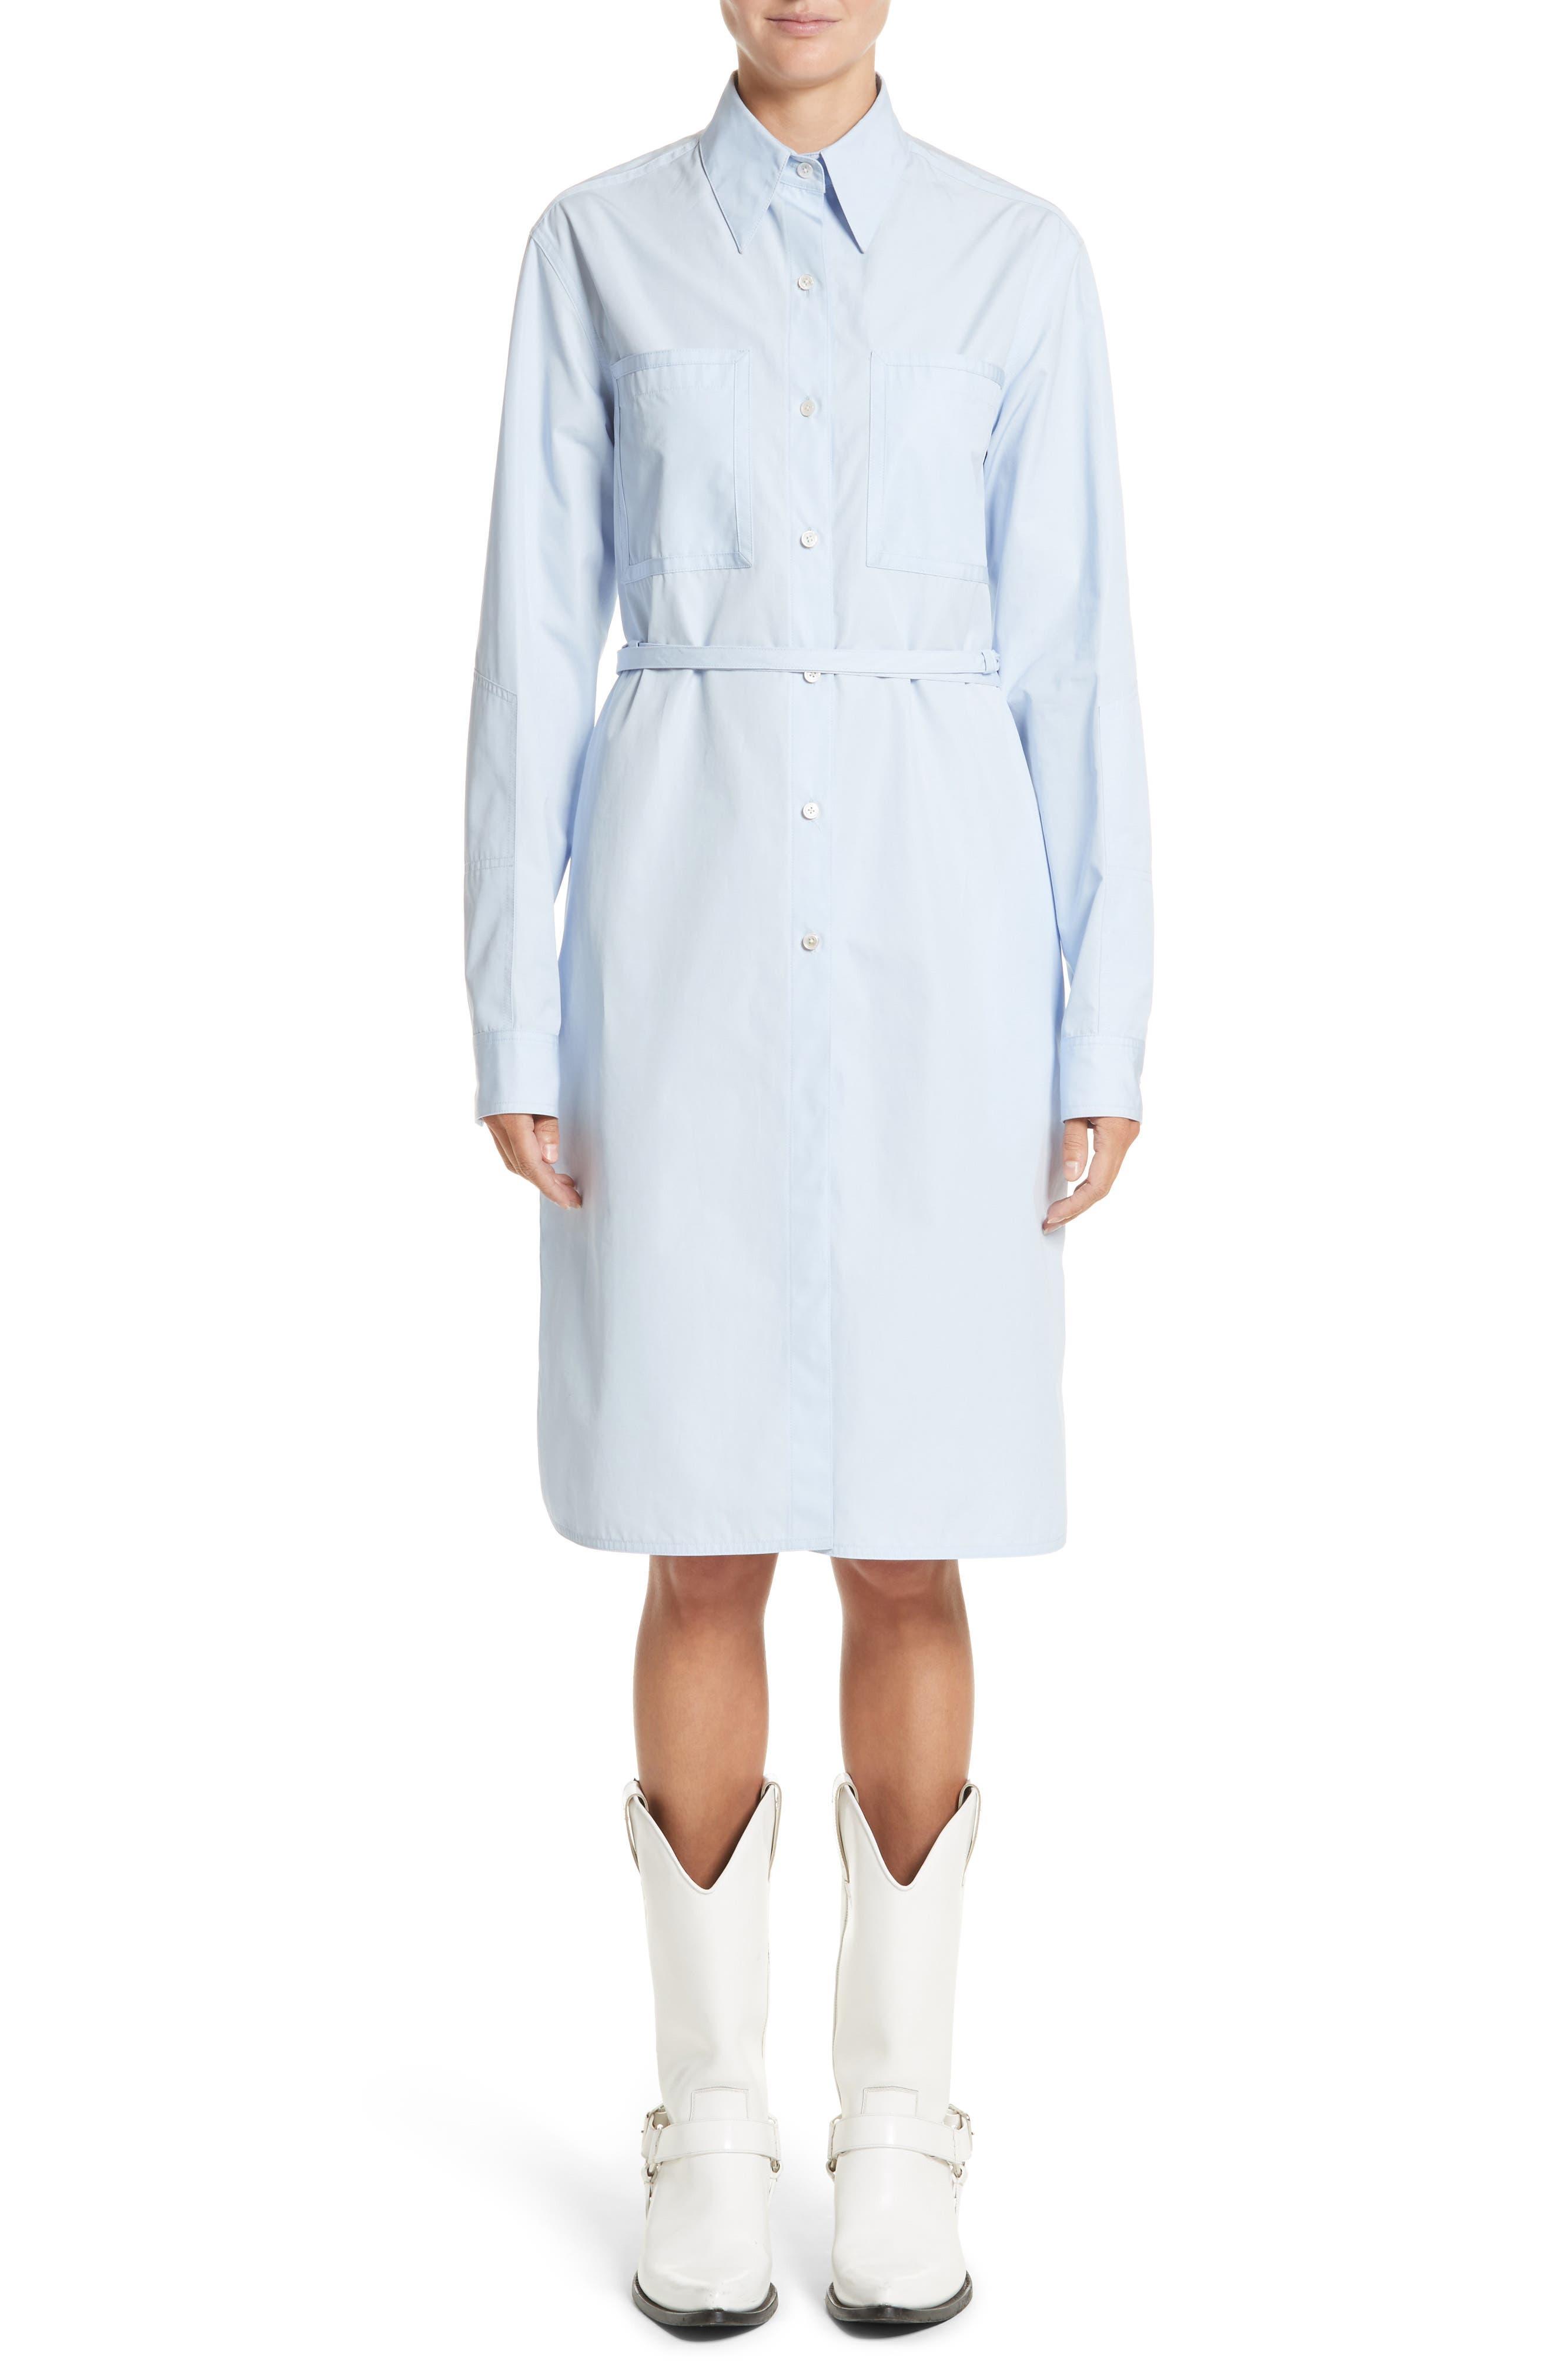 Lace-Up Back Cotton Poplin Dress,                             Main thumbnail 1, color,                             437